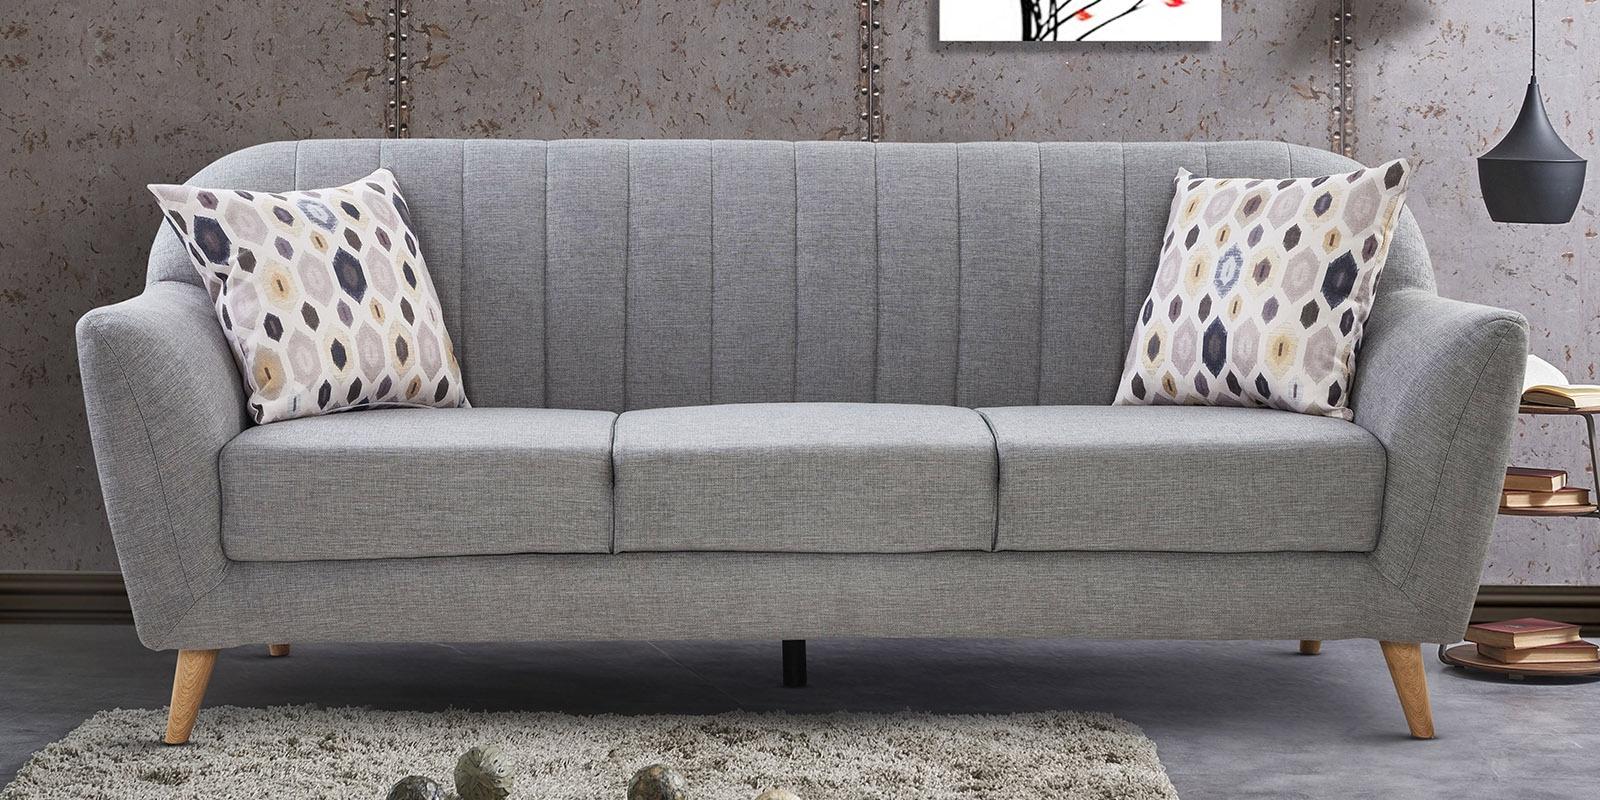 2018 Ludovic Contemporary Sofas Light Gray Regarding Buy Antalya 3 Seater Sofa In Grey Coloururban Living (View 7 of 25)